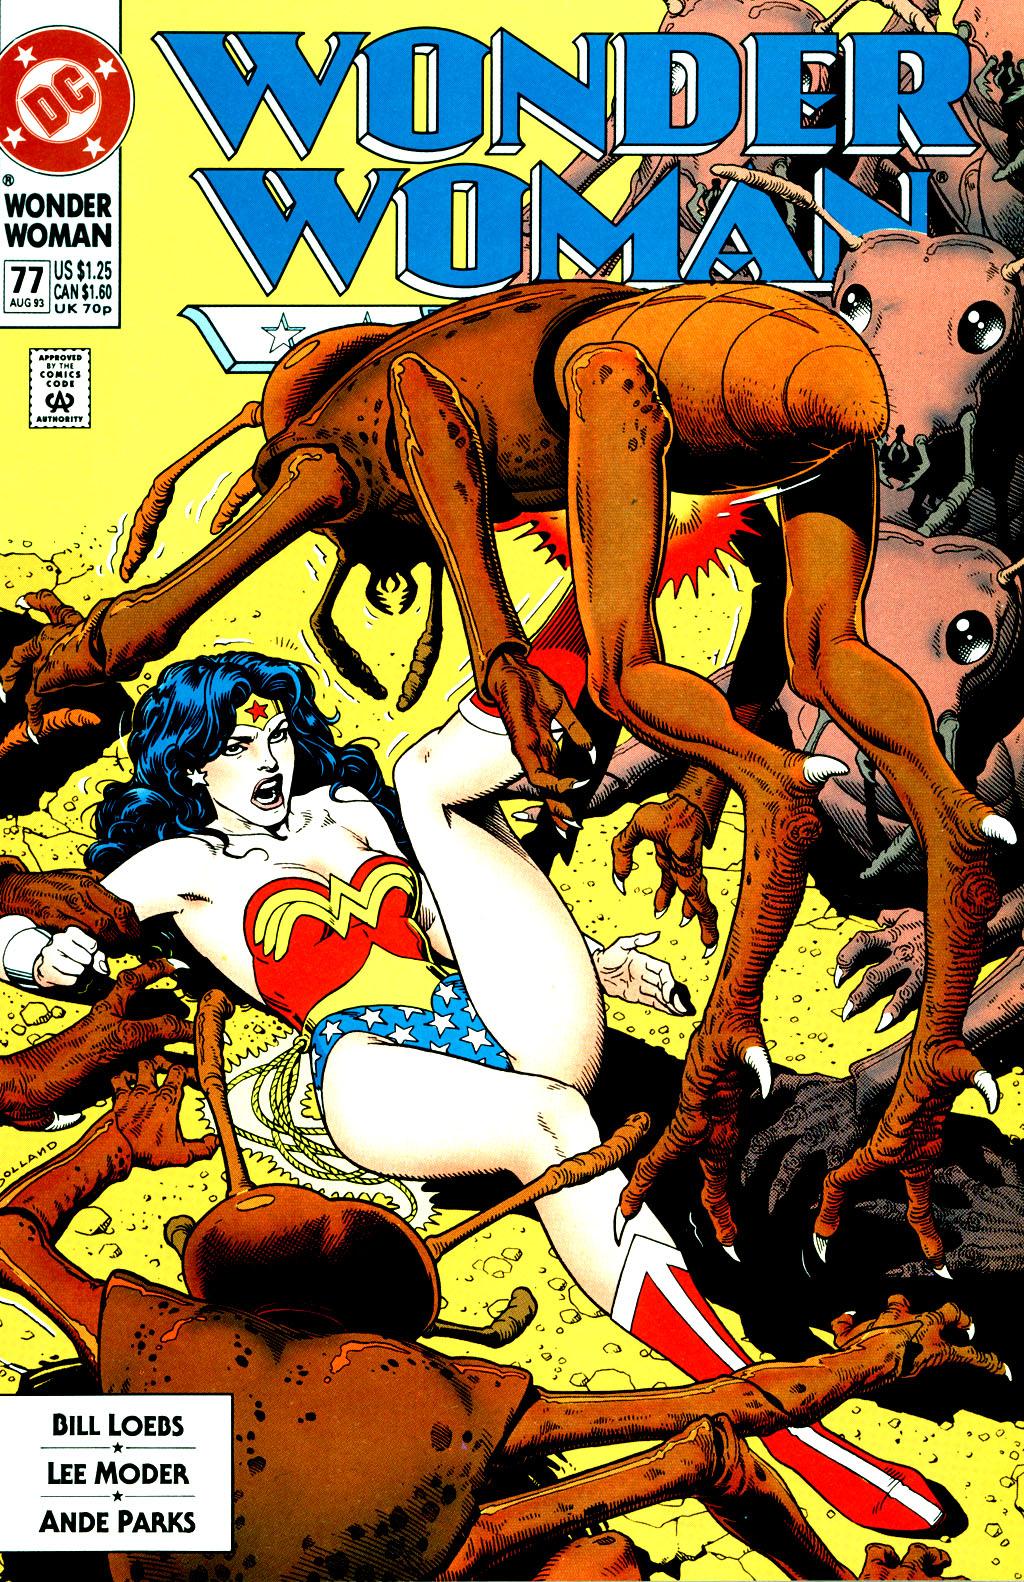 Read online Wonder Woman (1987) comic -  Issue #77 - 1